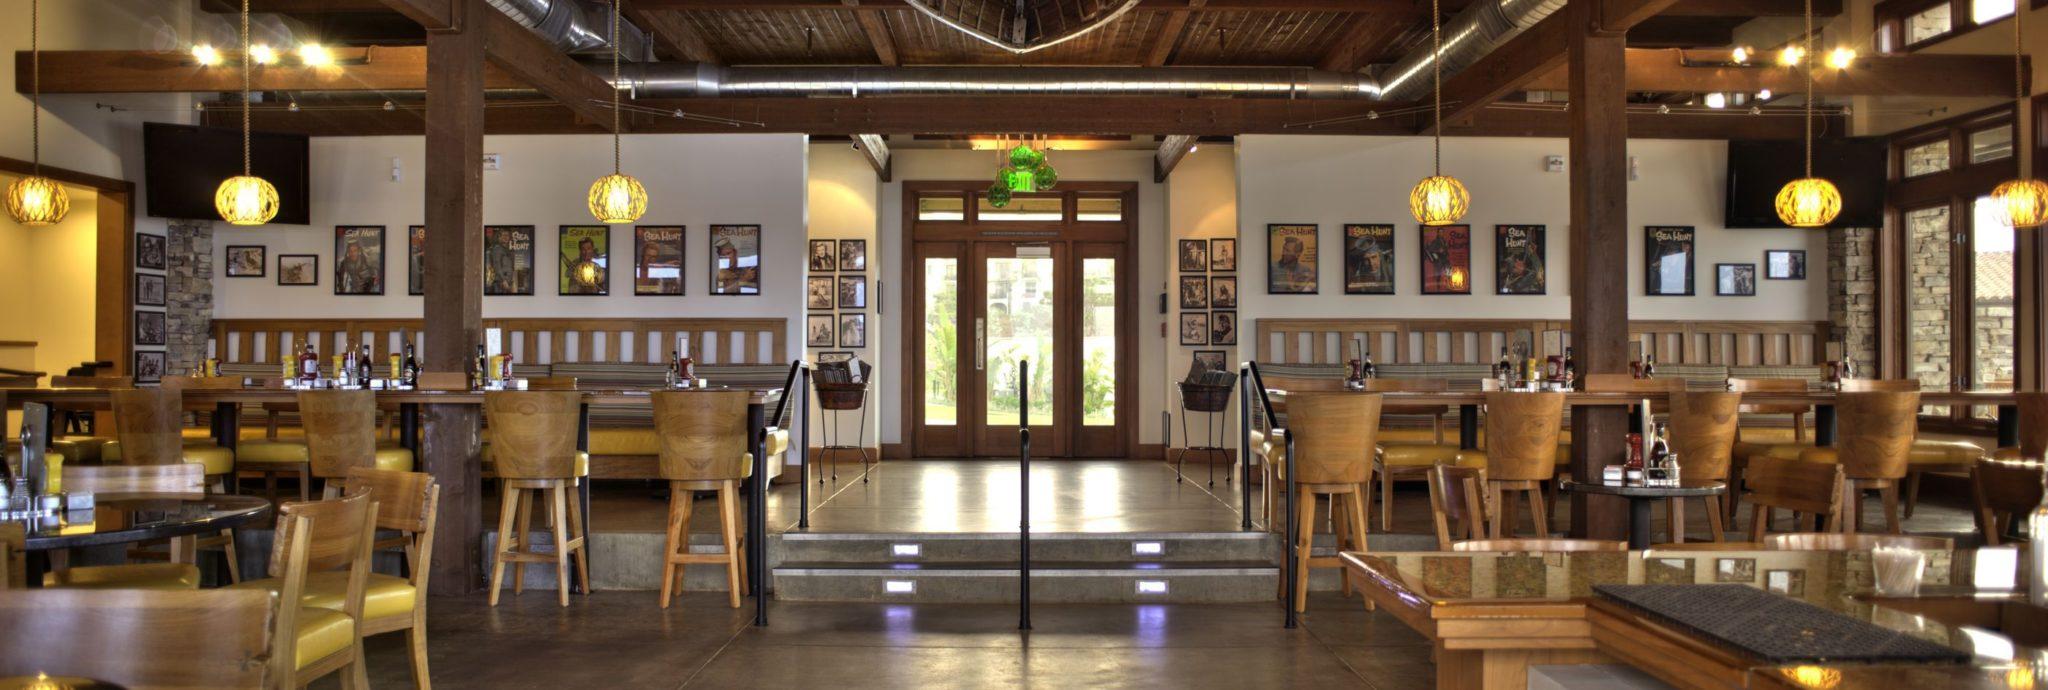 Bright interior of entrance